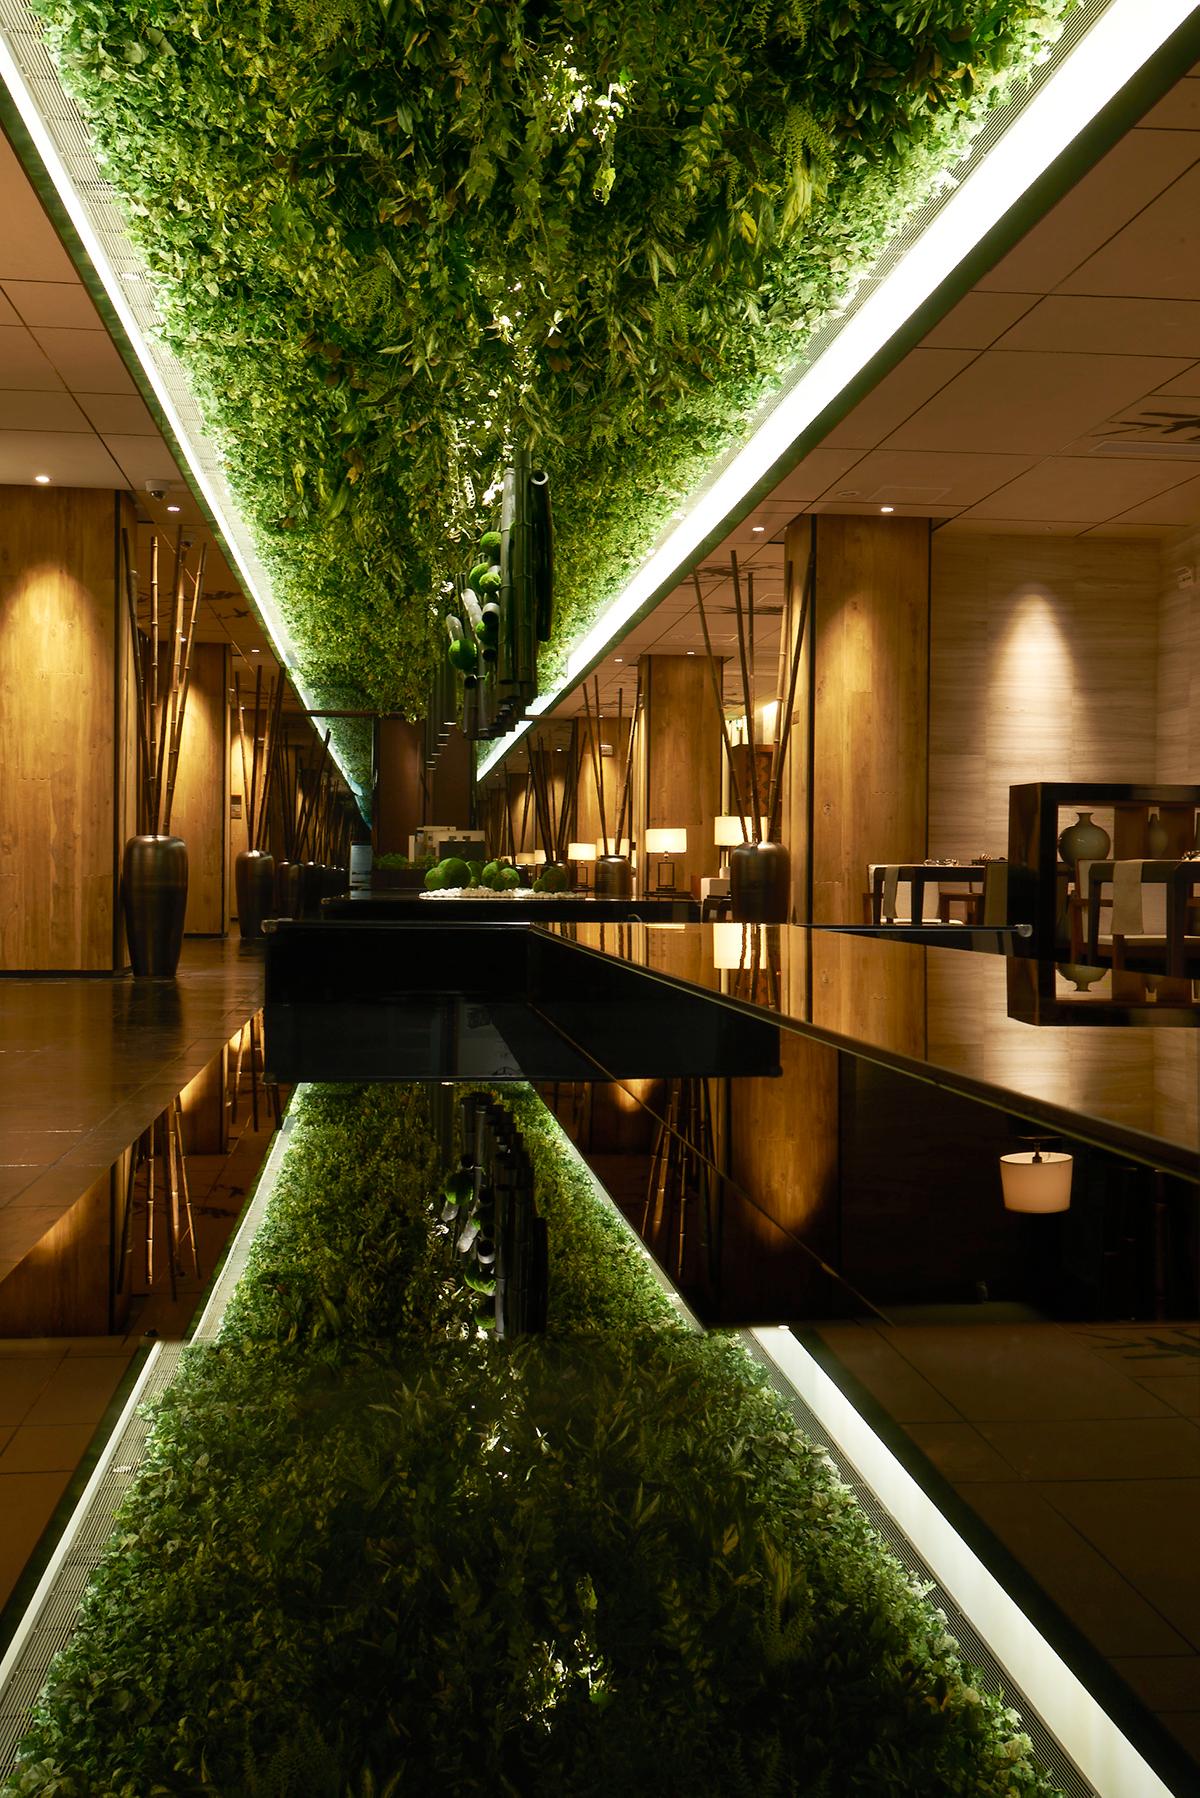 Green Belt Lounge Moonlit Garden Wuxi On Behance